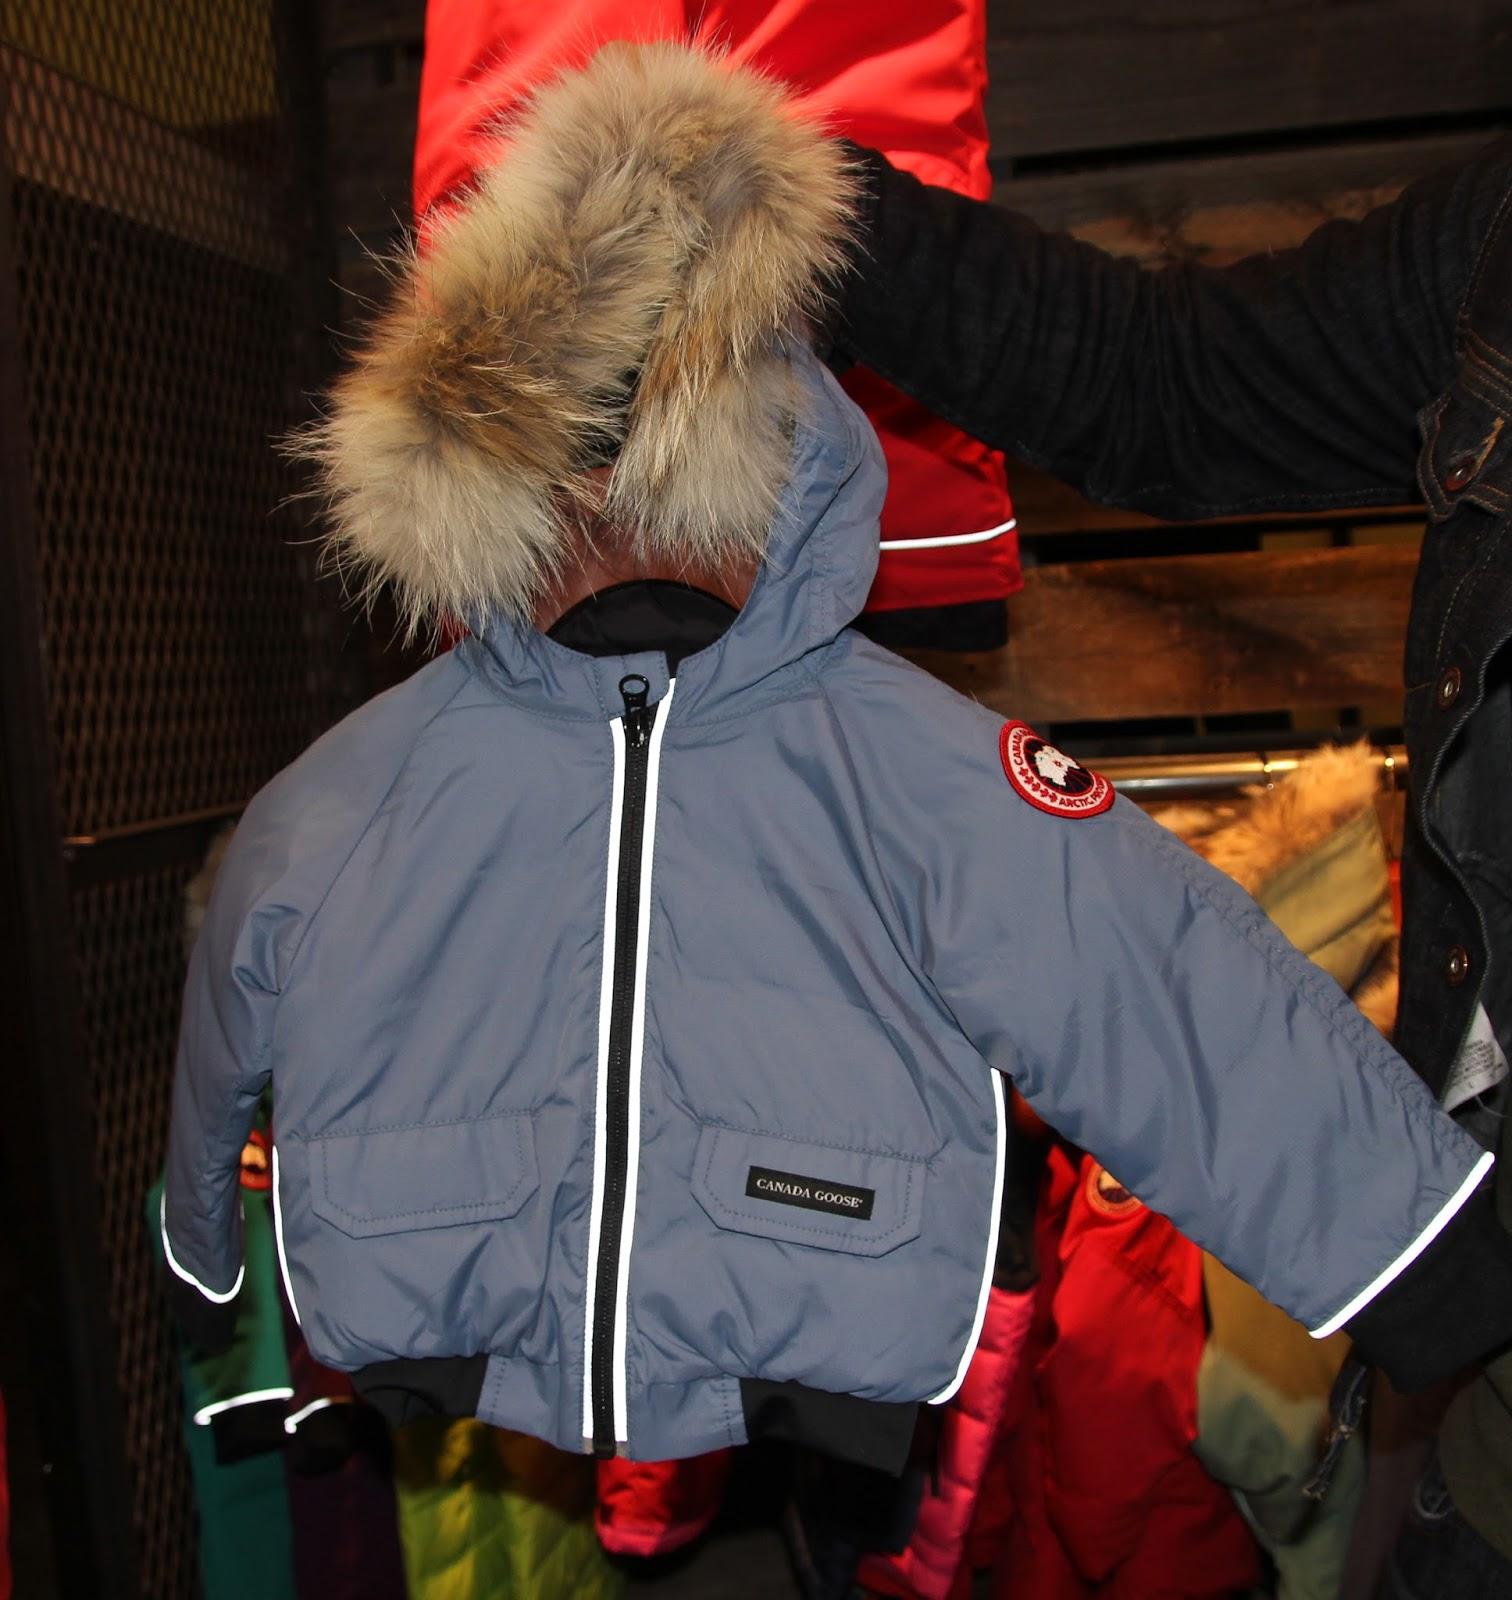 eb706e2ff CANADA GOOSE Outerwear Fall 2013 14